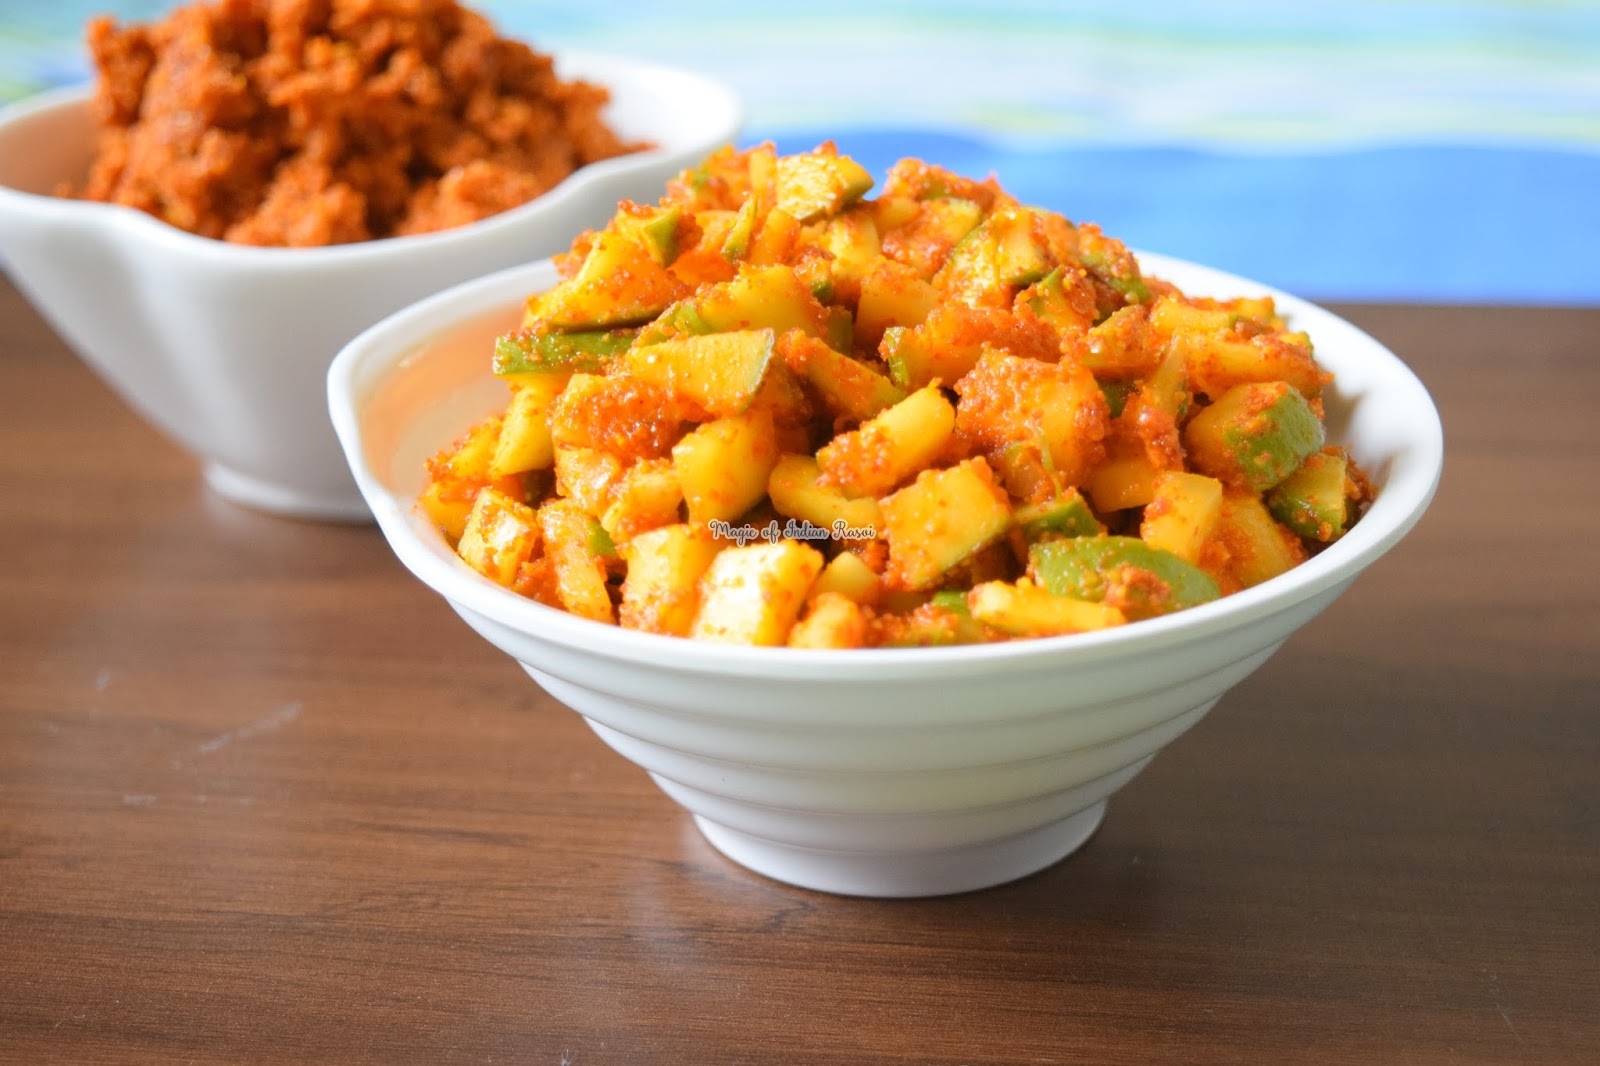 Methia Masala & Instant Mango Pickle Recipe - अचार मसाला और इंस्टेंट आम का अचार रेसिपी - Priya R - Magic of Indian Rasoi